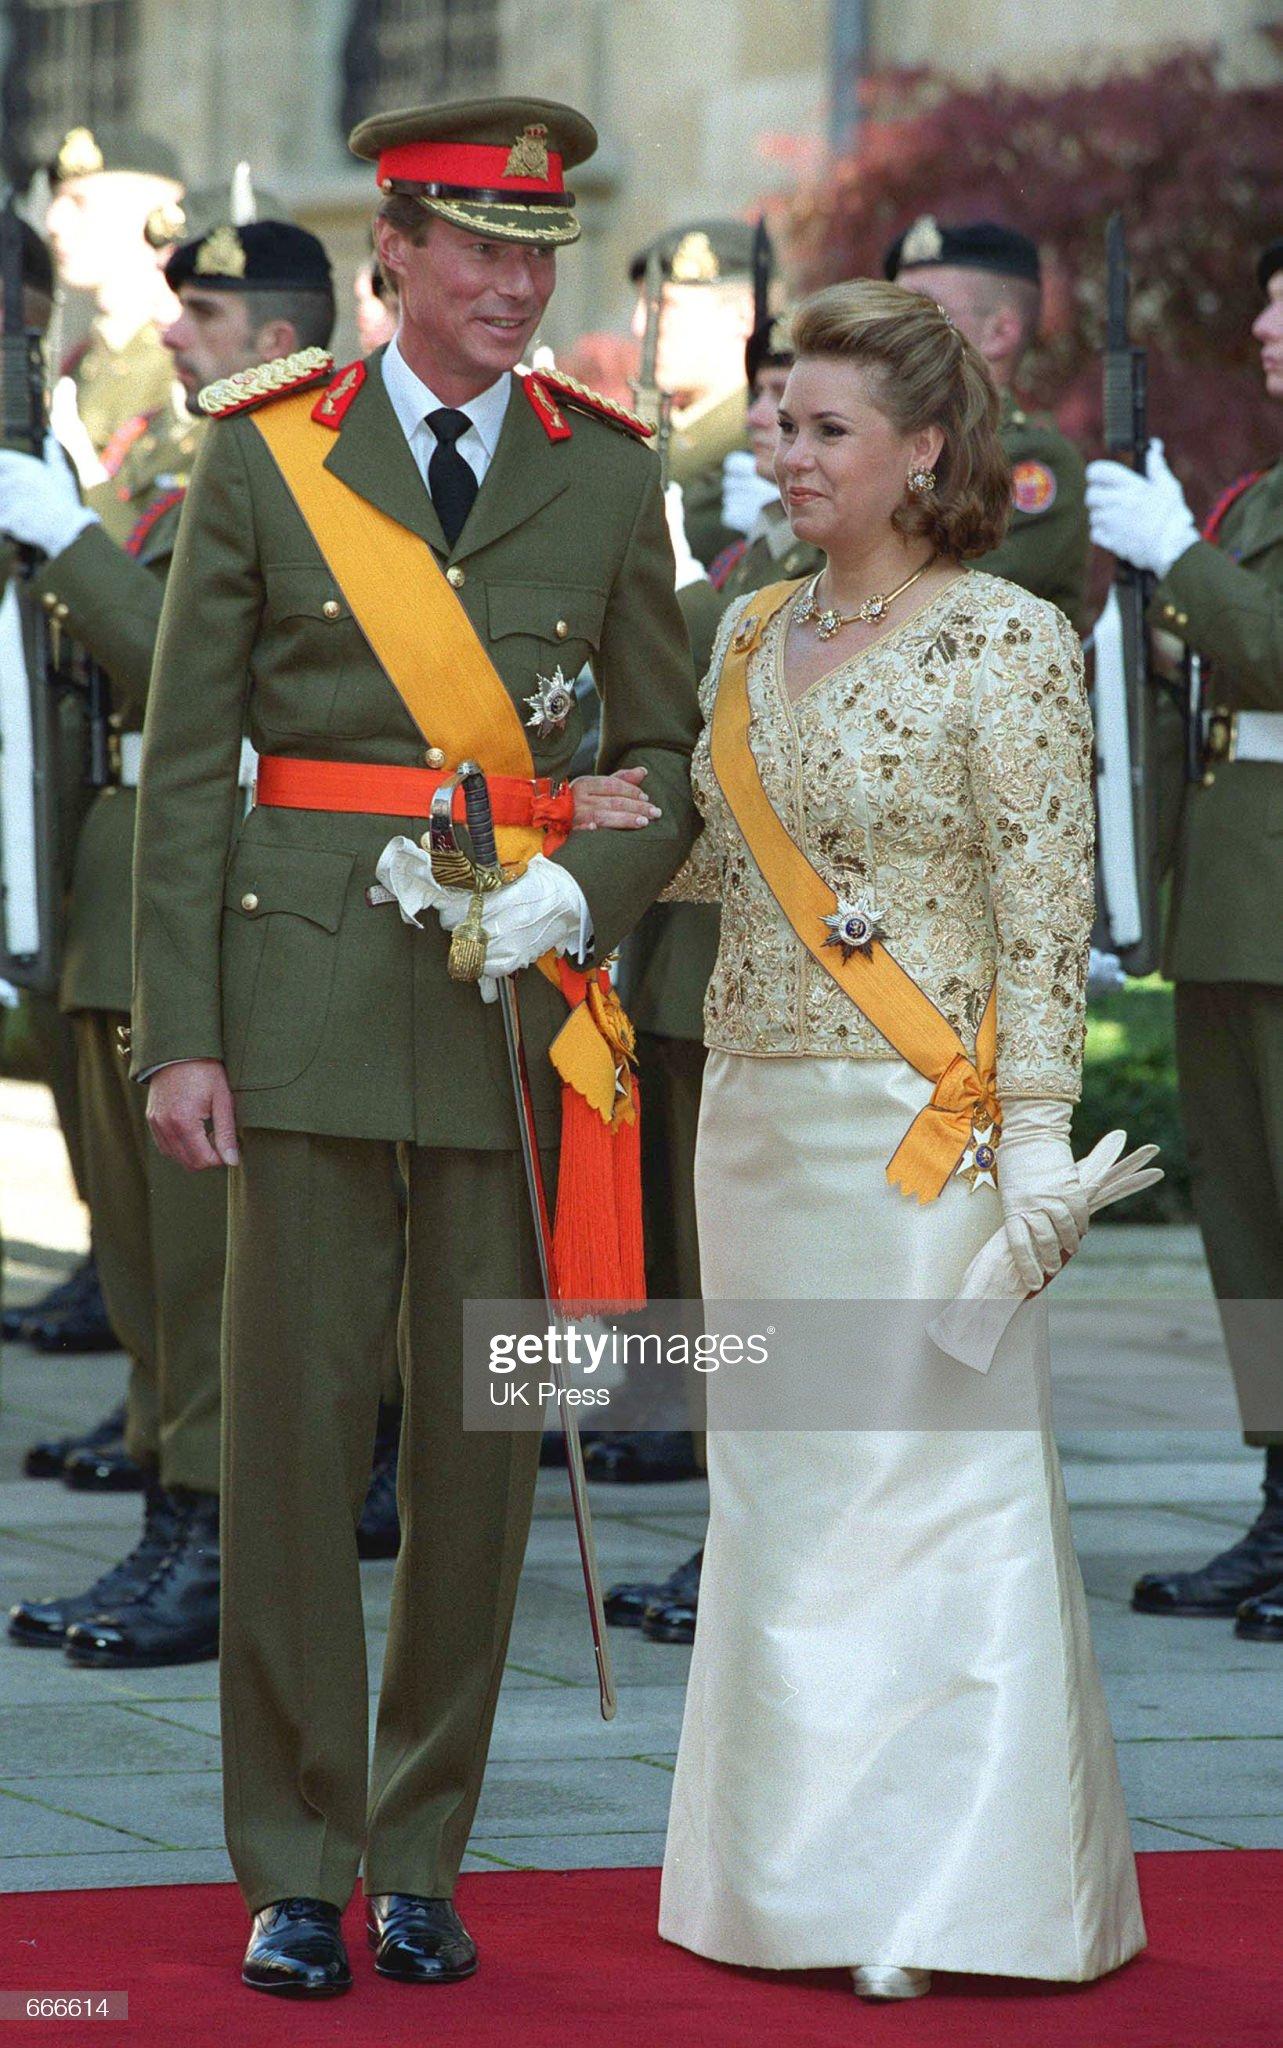 Grand Duke Henri of Luxembourg Sworn In : News Photo